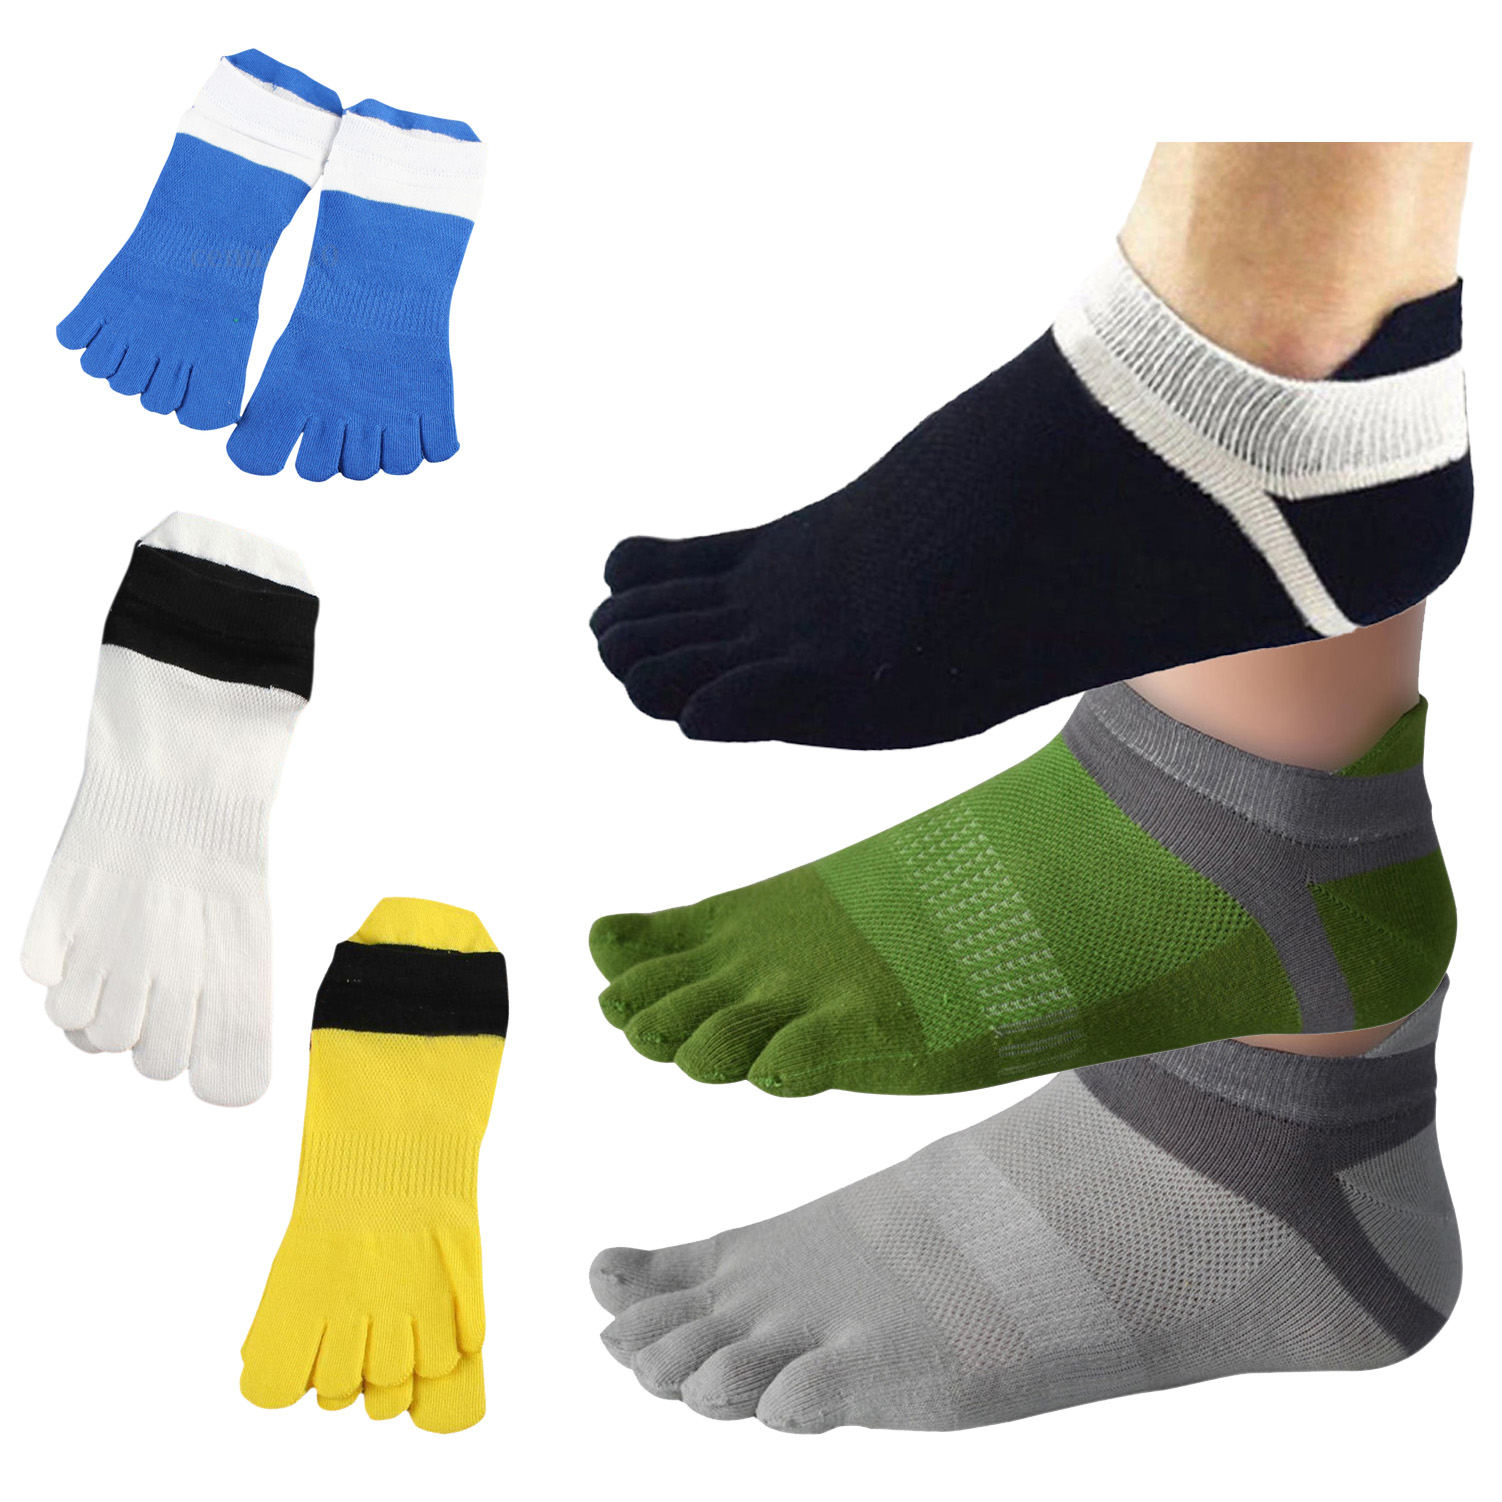 1 Paar Maenner Bequeme Atmungsaktive Baumwolle Socken Sport Fuenf-Finger So O4M9